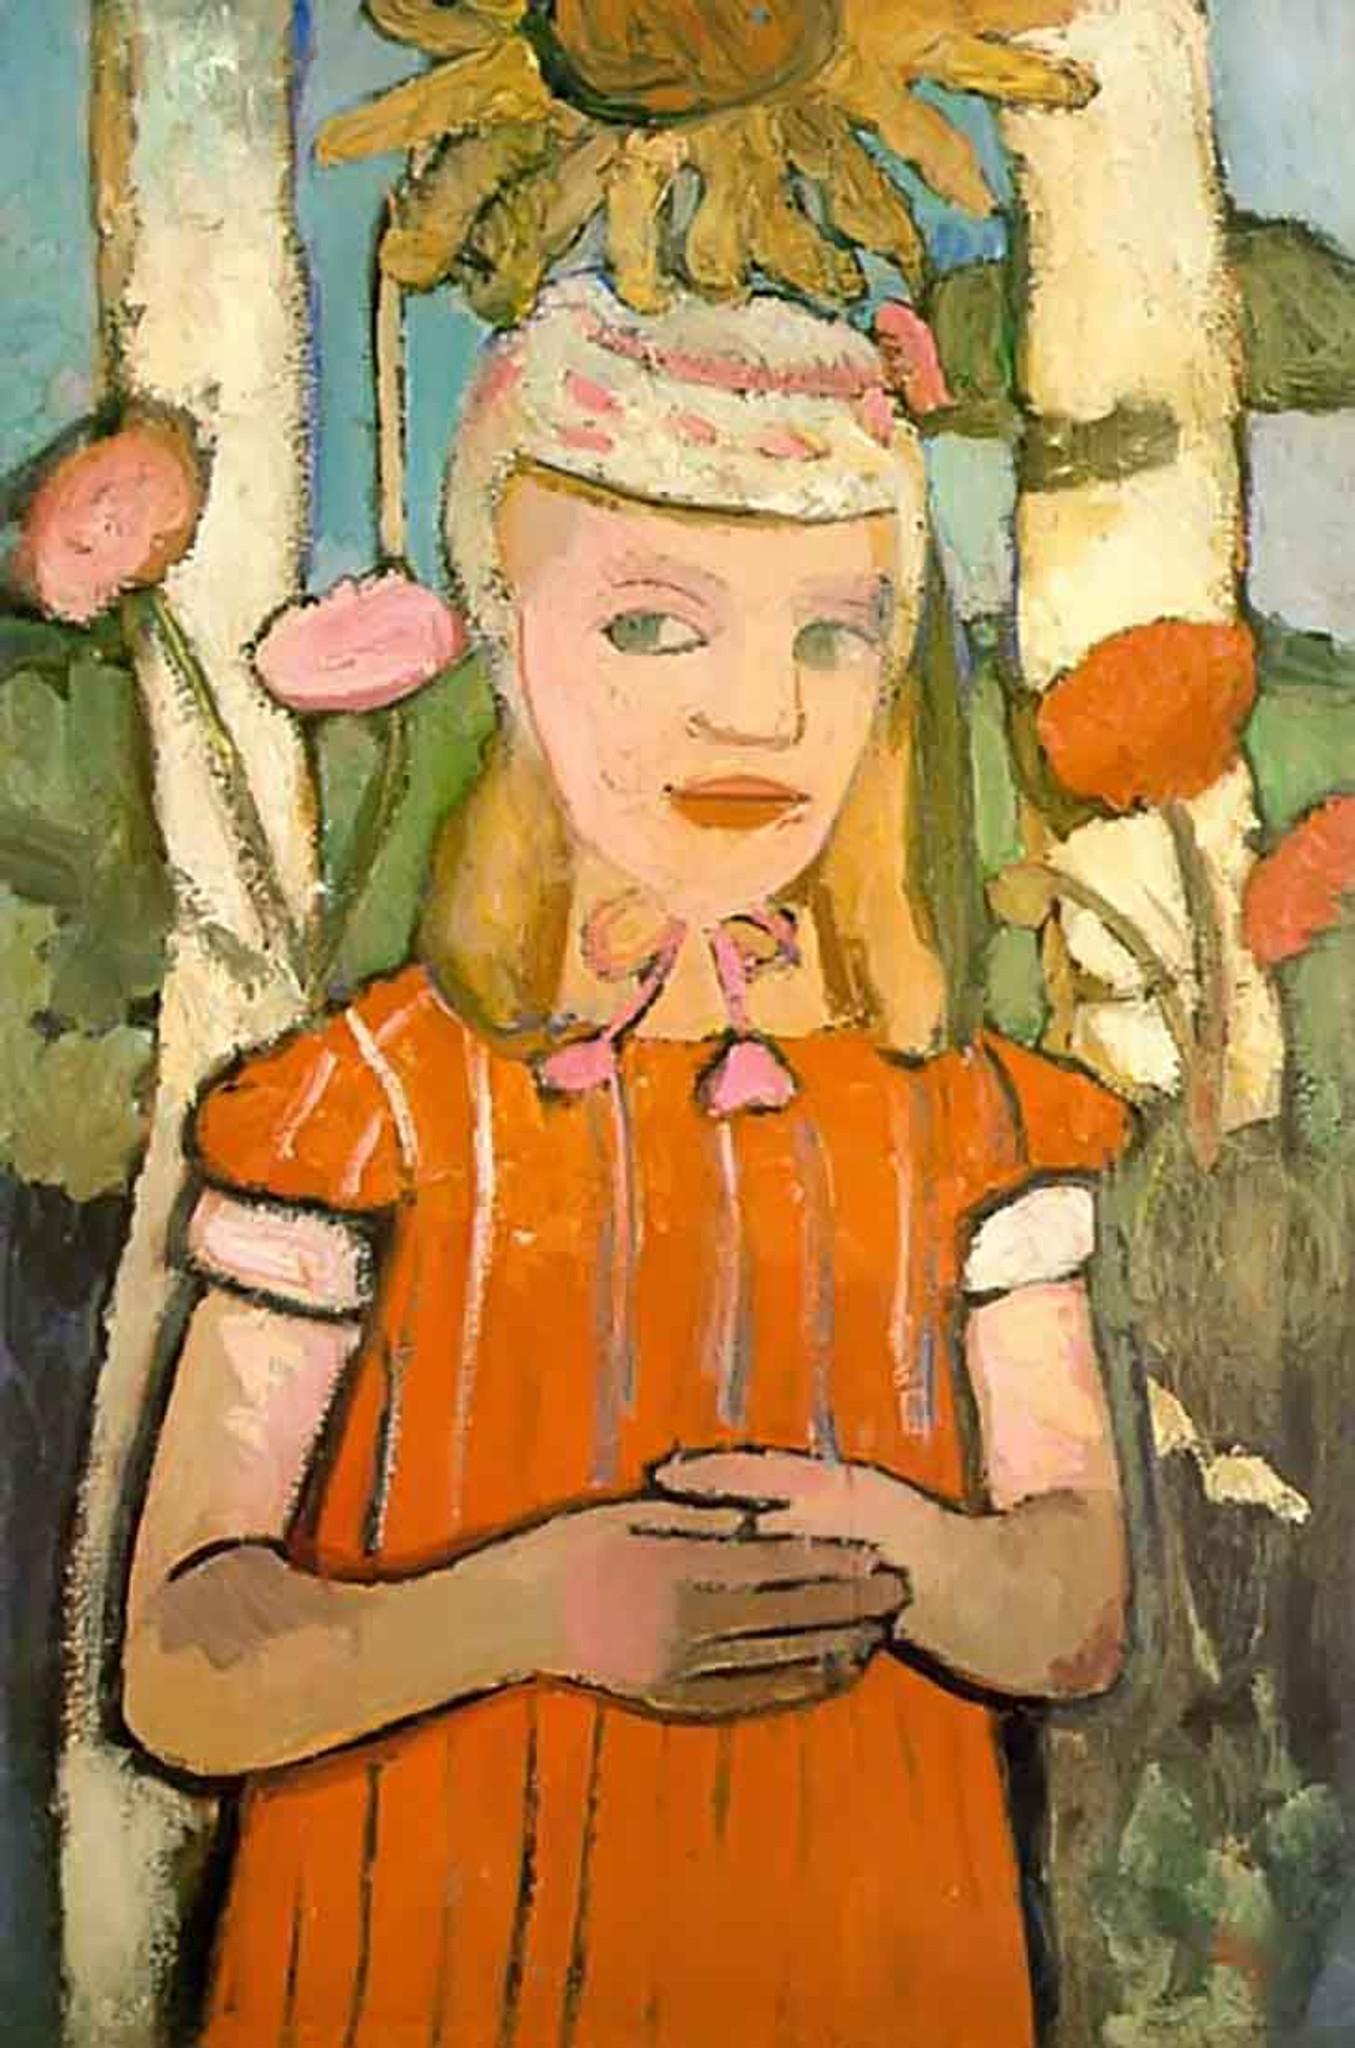 Worpswede Child By Paula Modersohn Becker